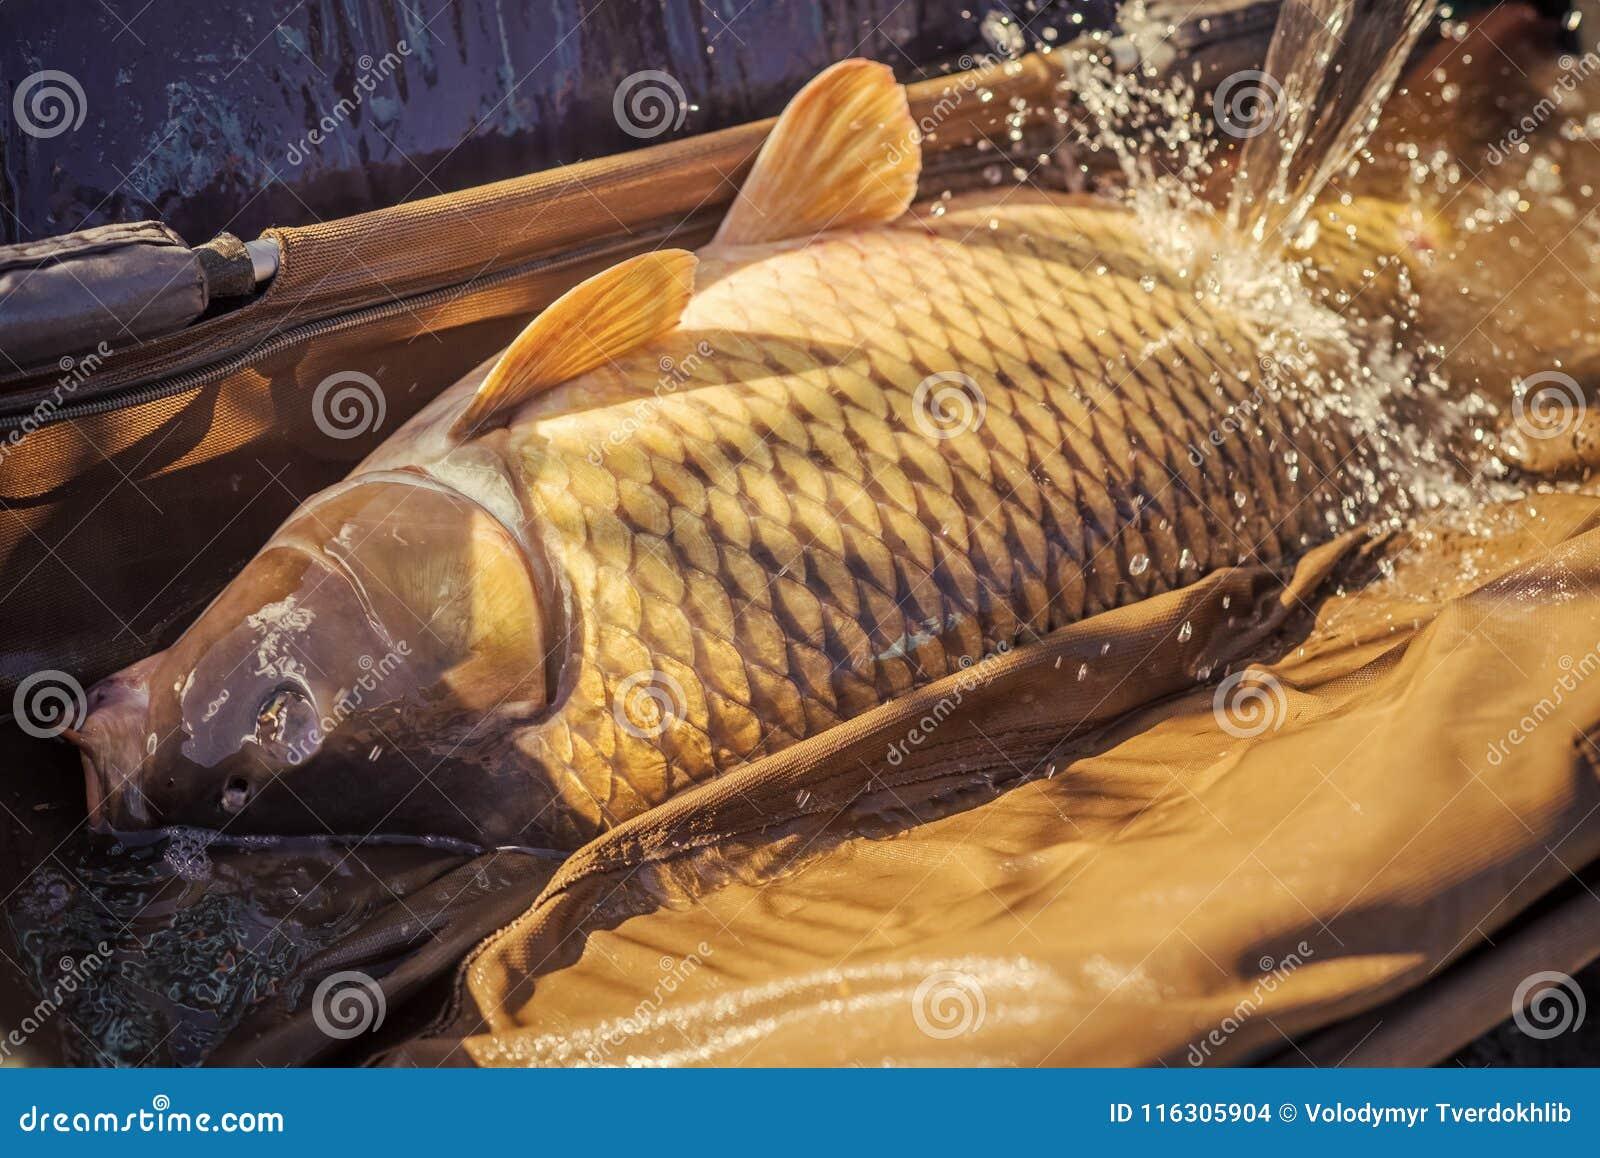 Carp fishing, angling, fish catching, capture